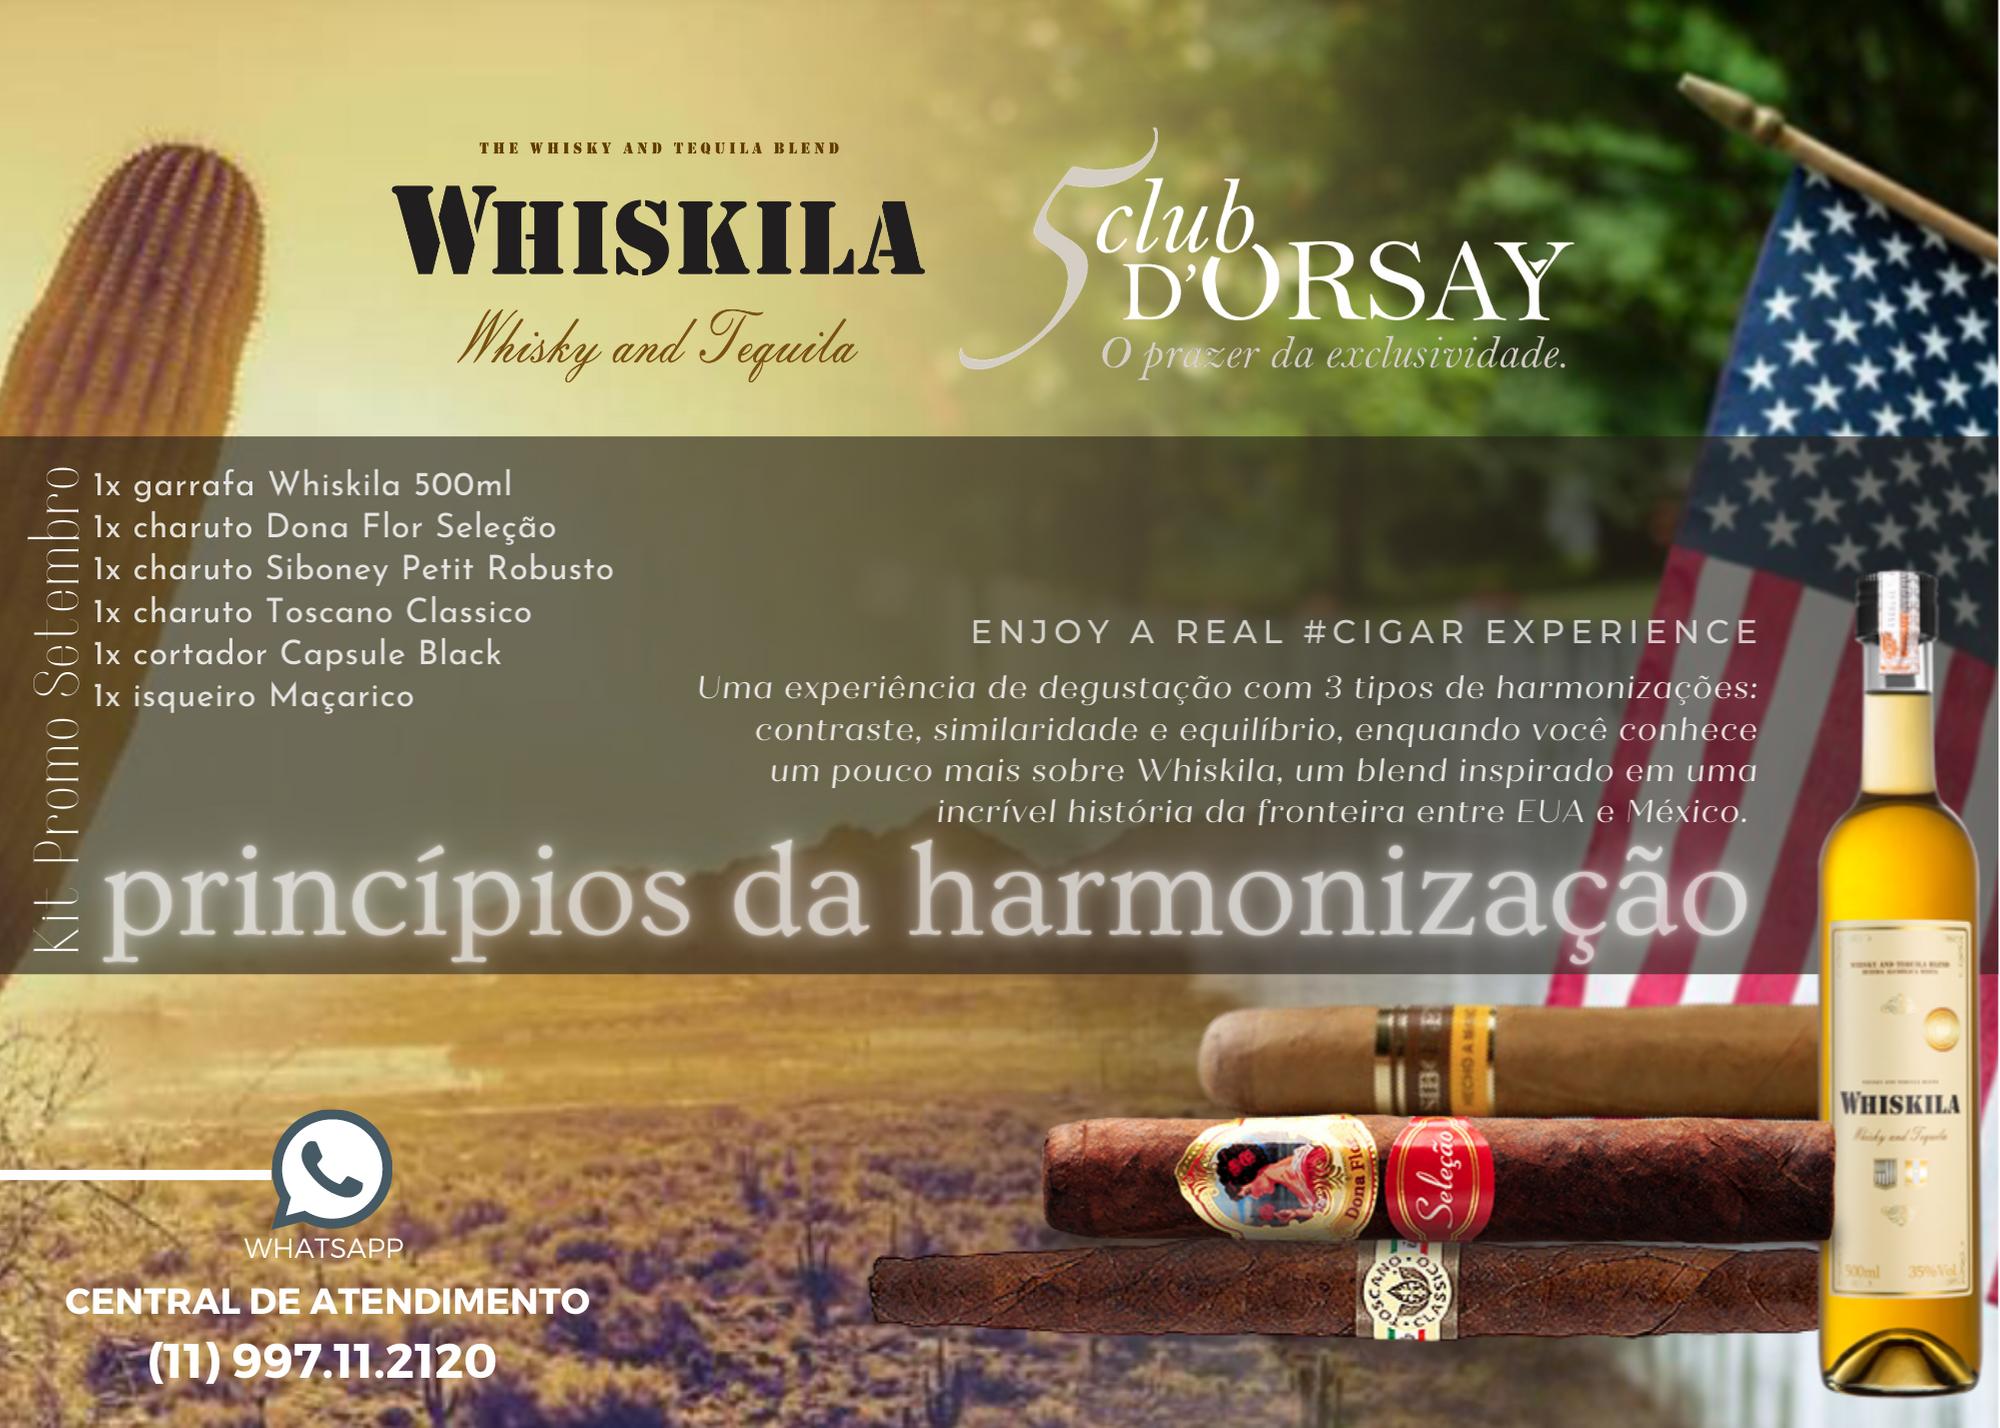 Whiskila Kit Harmonização Charutos Setembro 2020